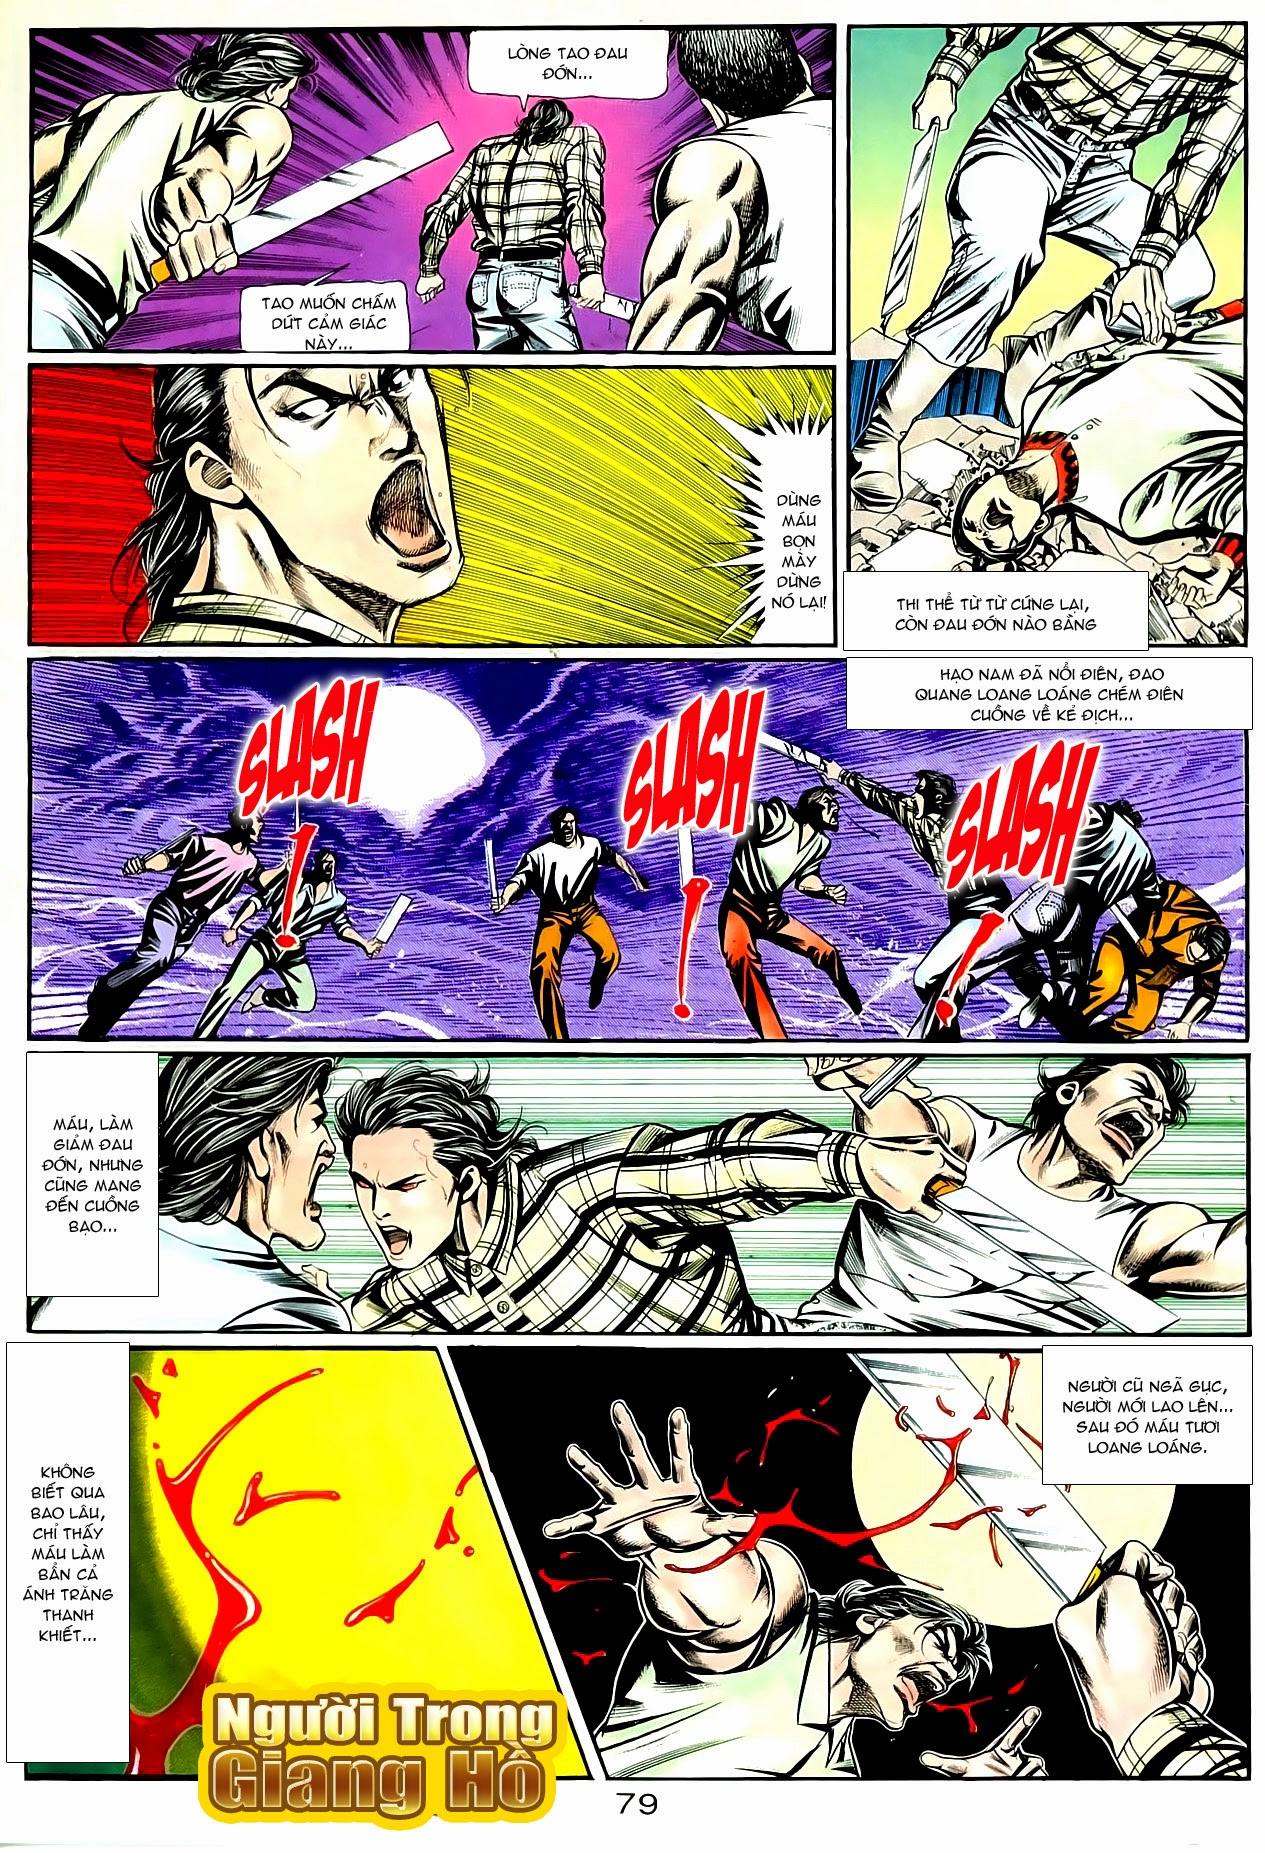 Người Trong Giang Hồ chapter 90: giang hồ hiểm trang 15